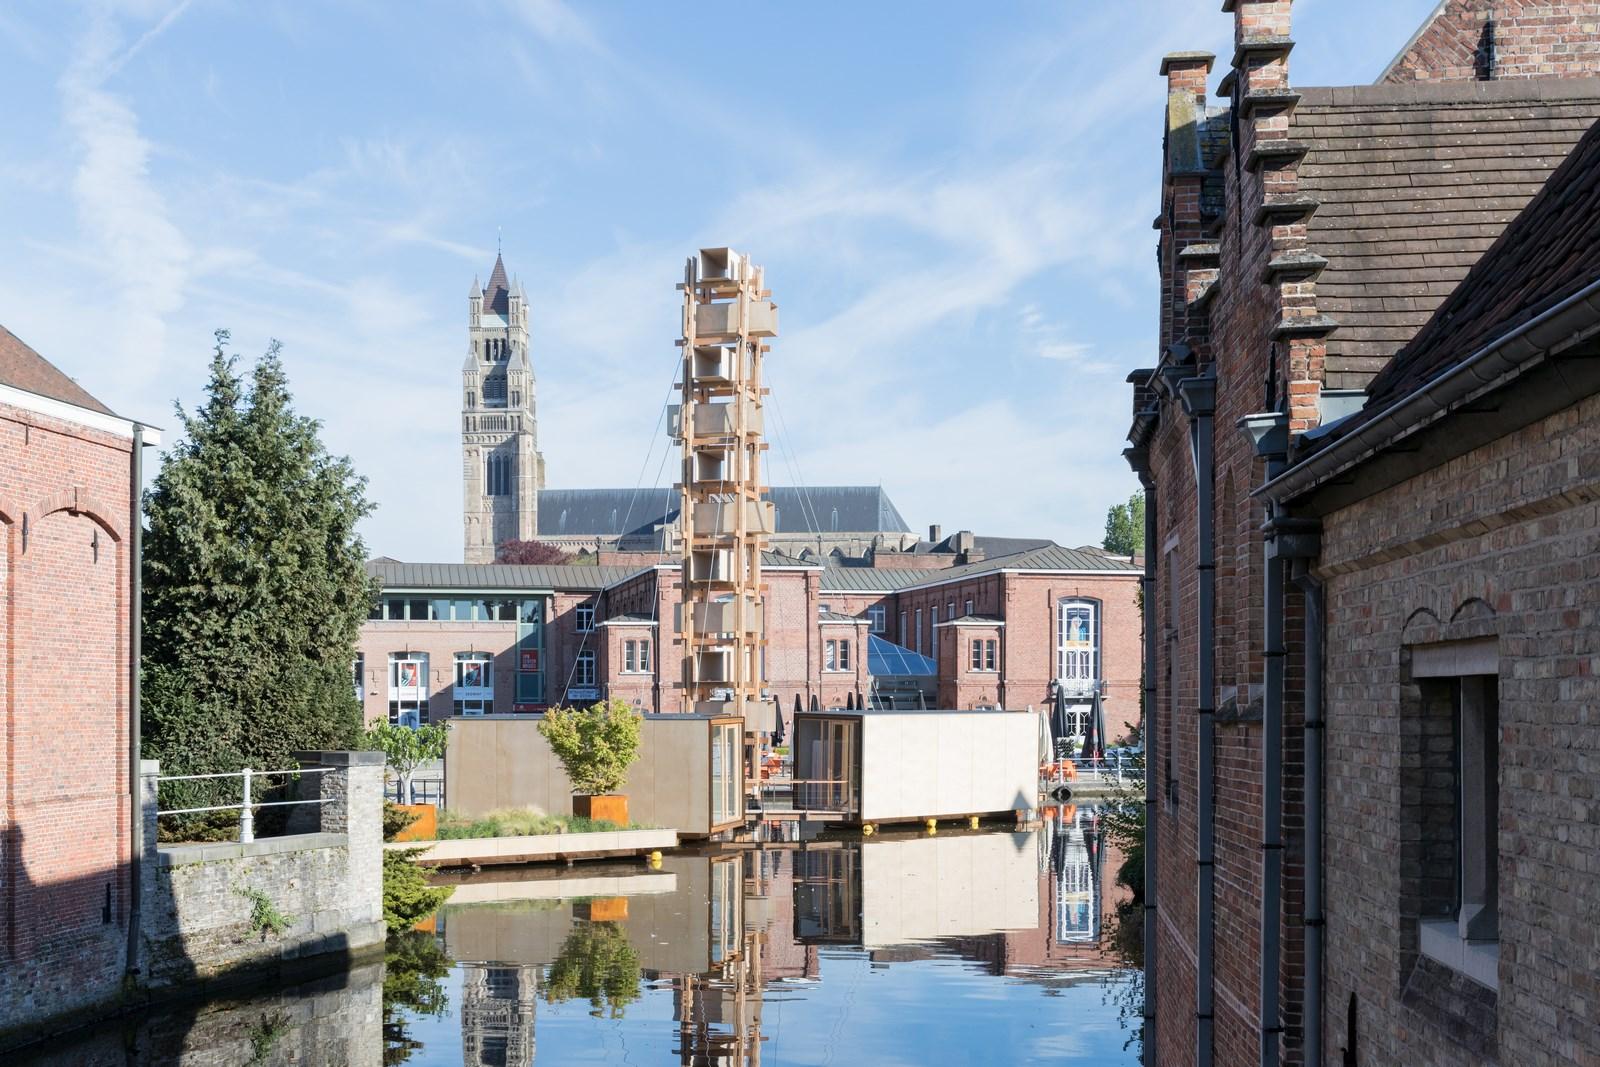 Triennale Brugge 2018_Peter Van Driessche_INFINITI²³_2 Foto Iwan Baan (Copy)